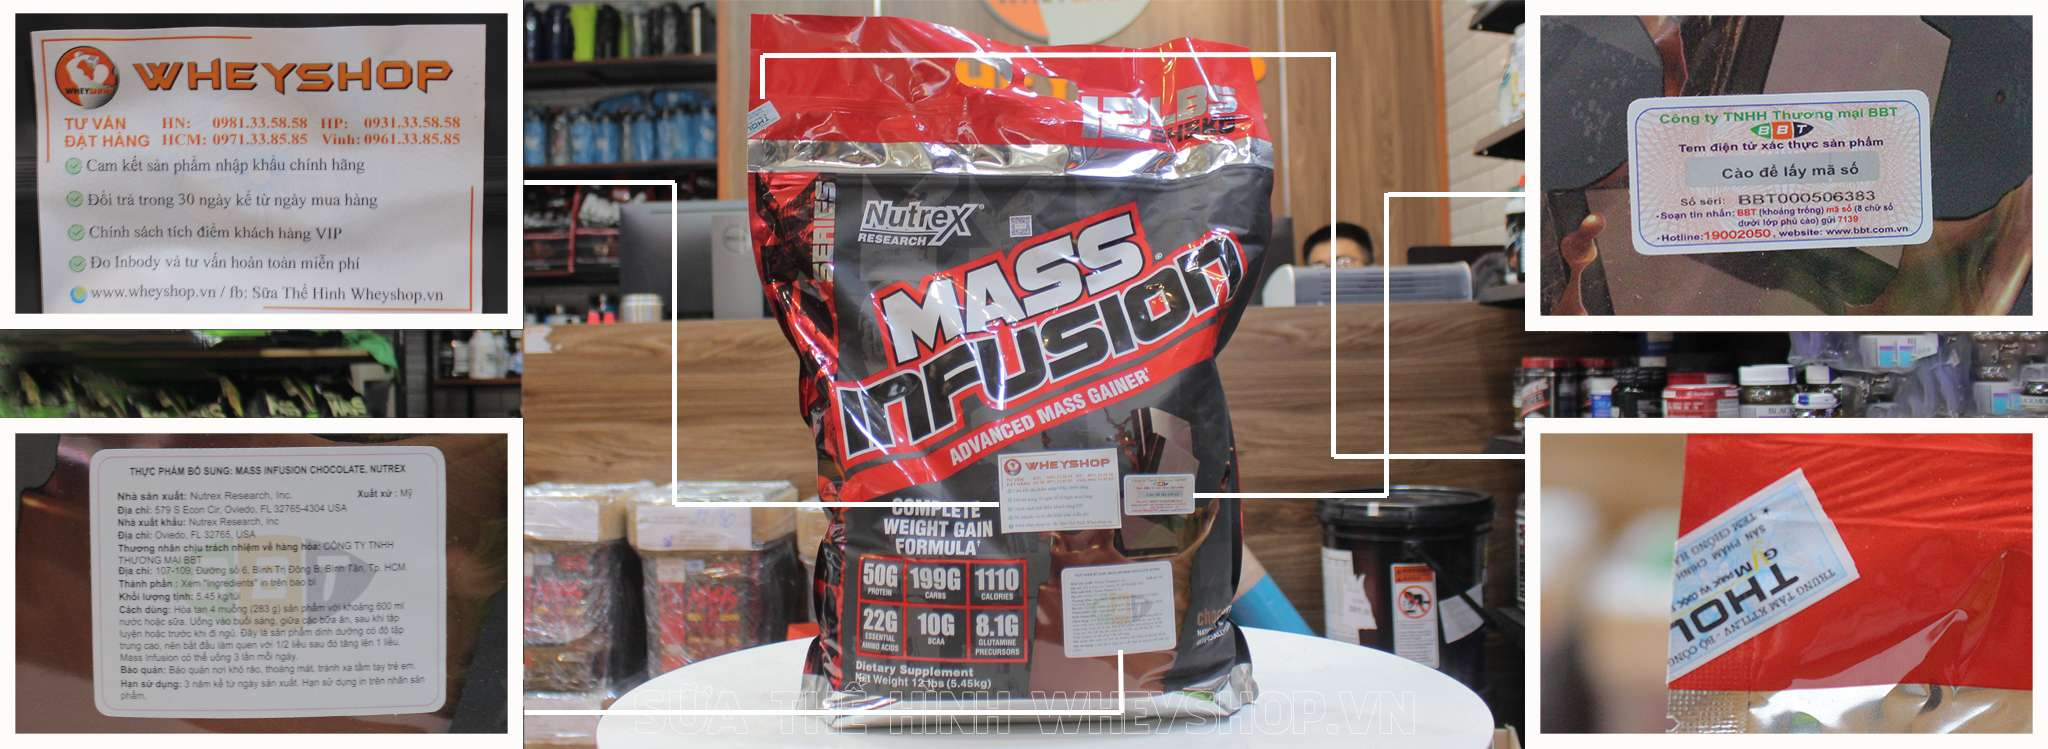 nutrex mass infusion tem nhan hieu chinh hang tai wheyshop